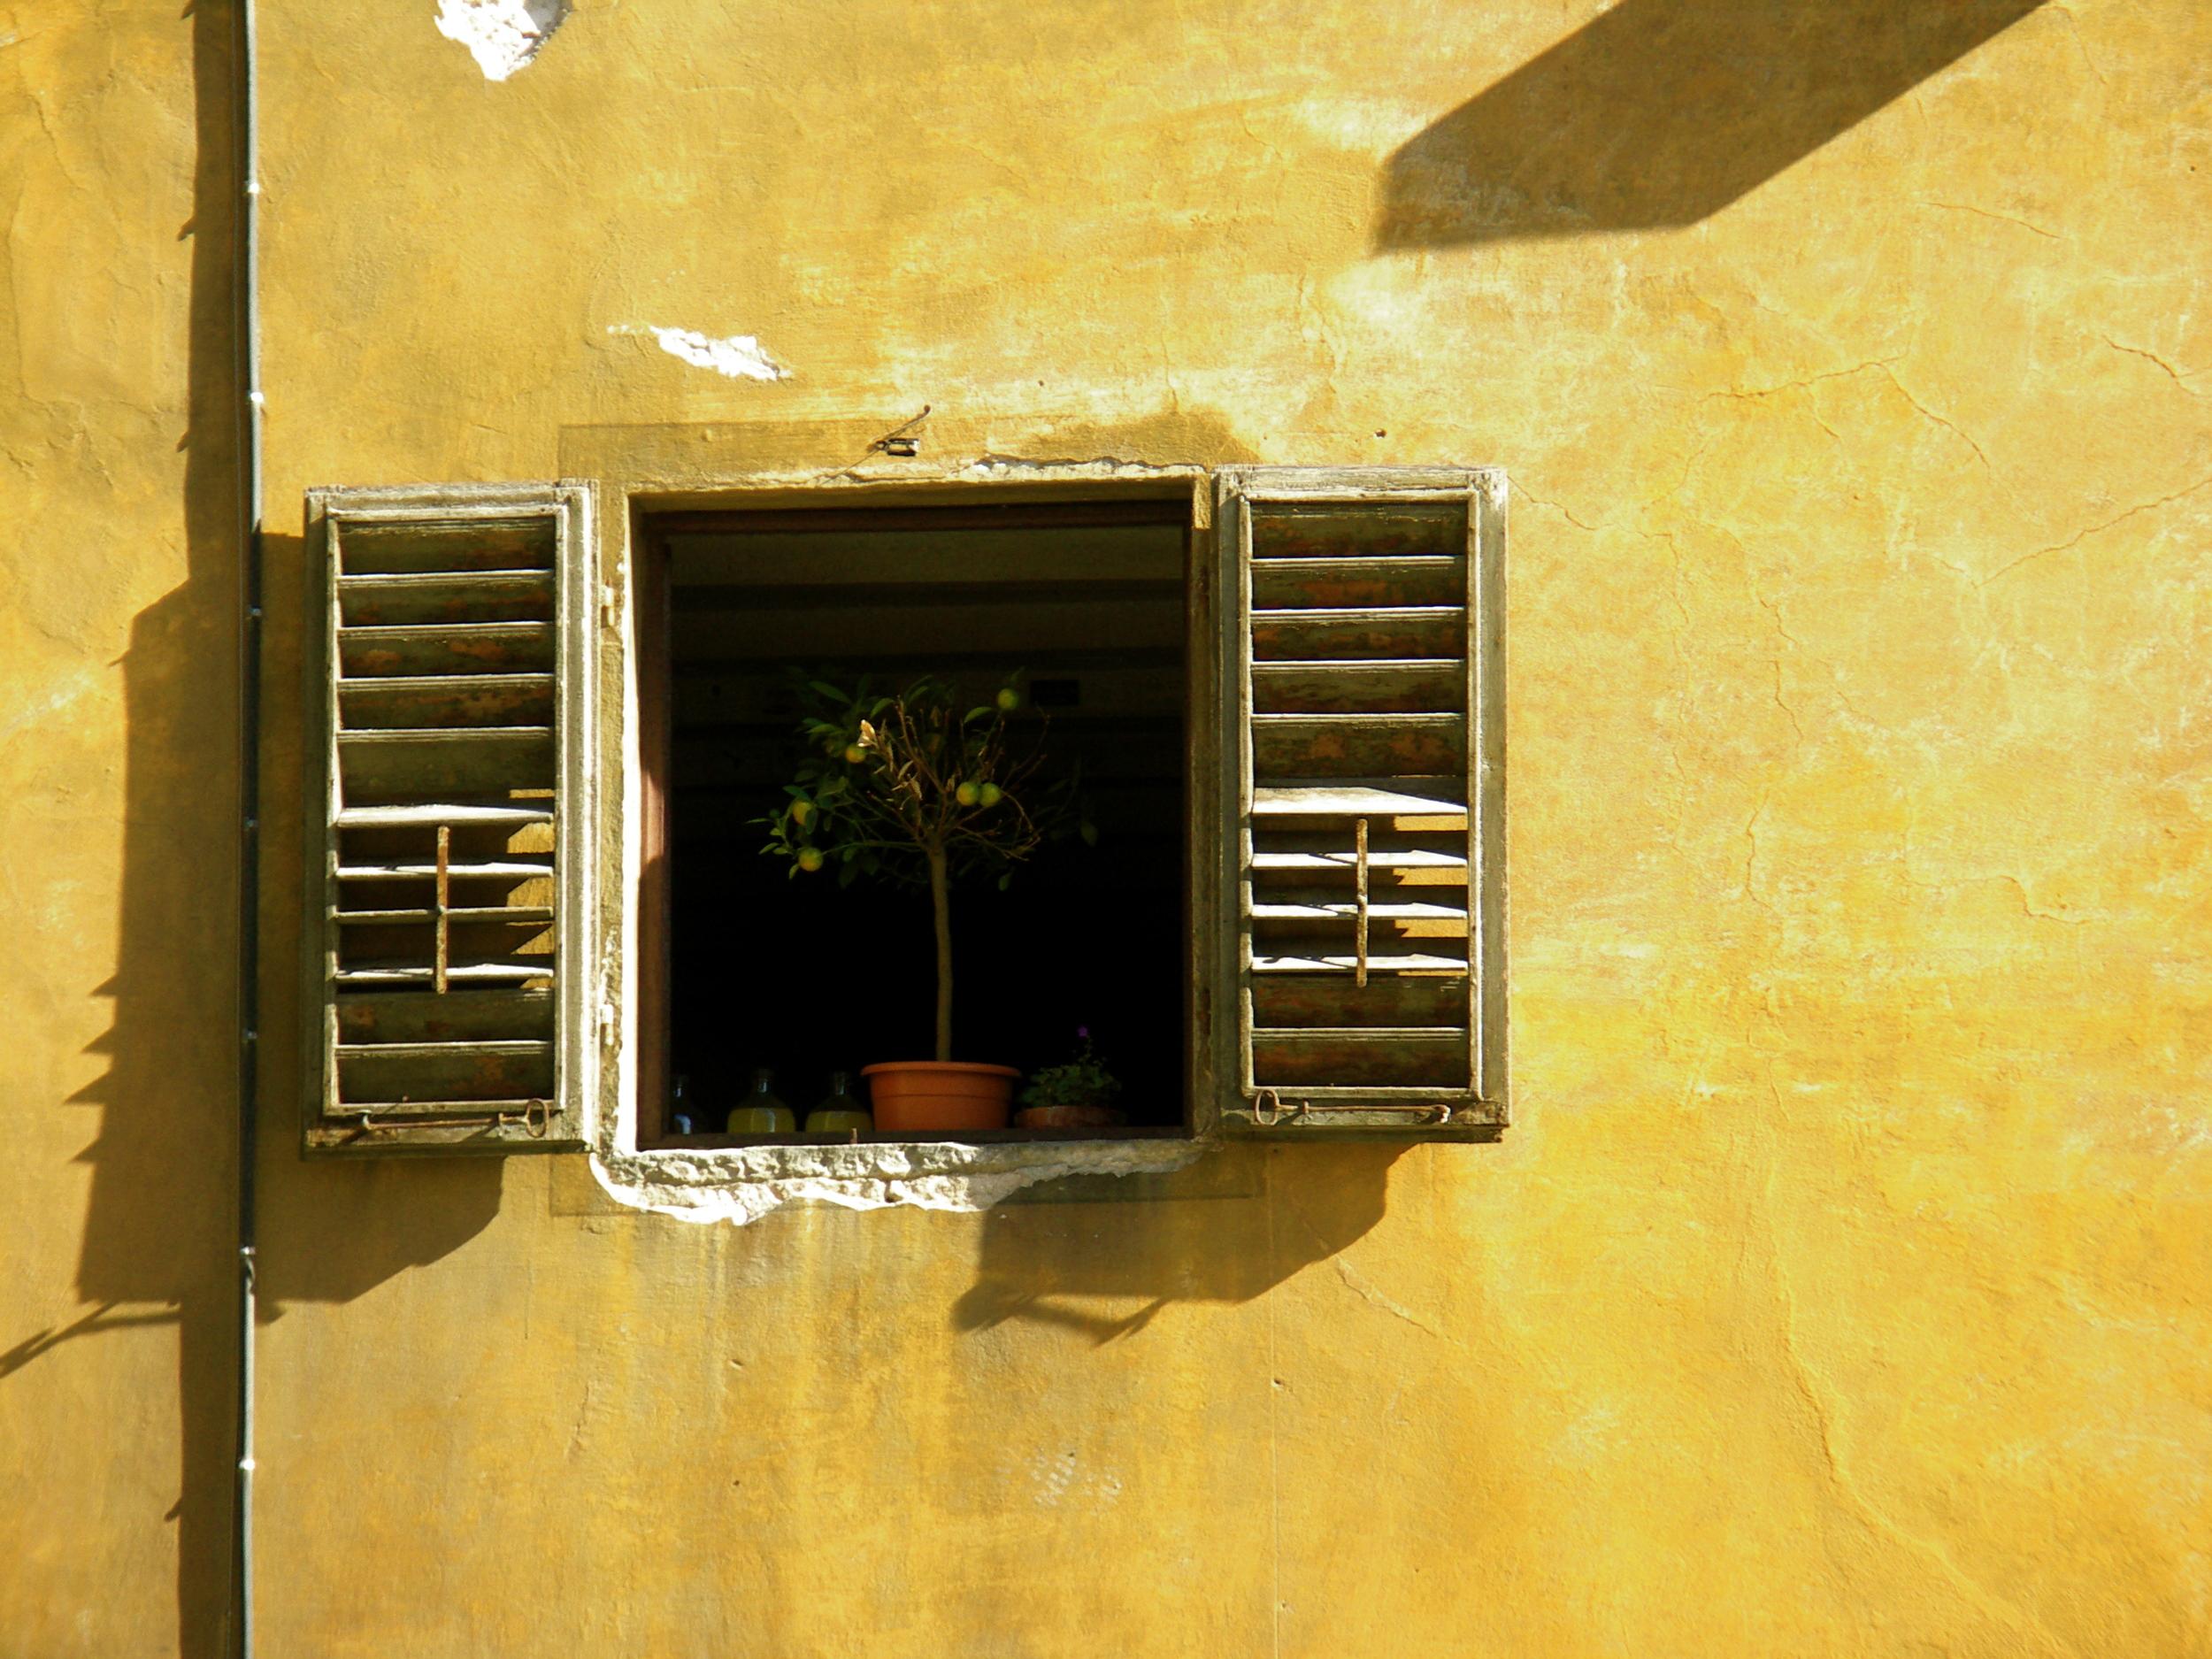 lime tree in window.jpg